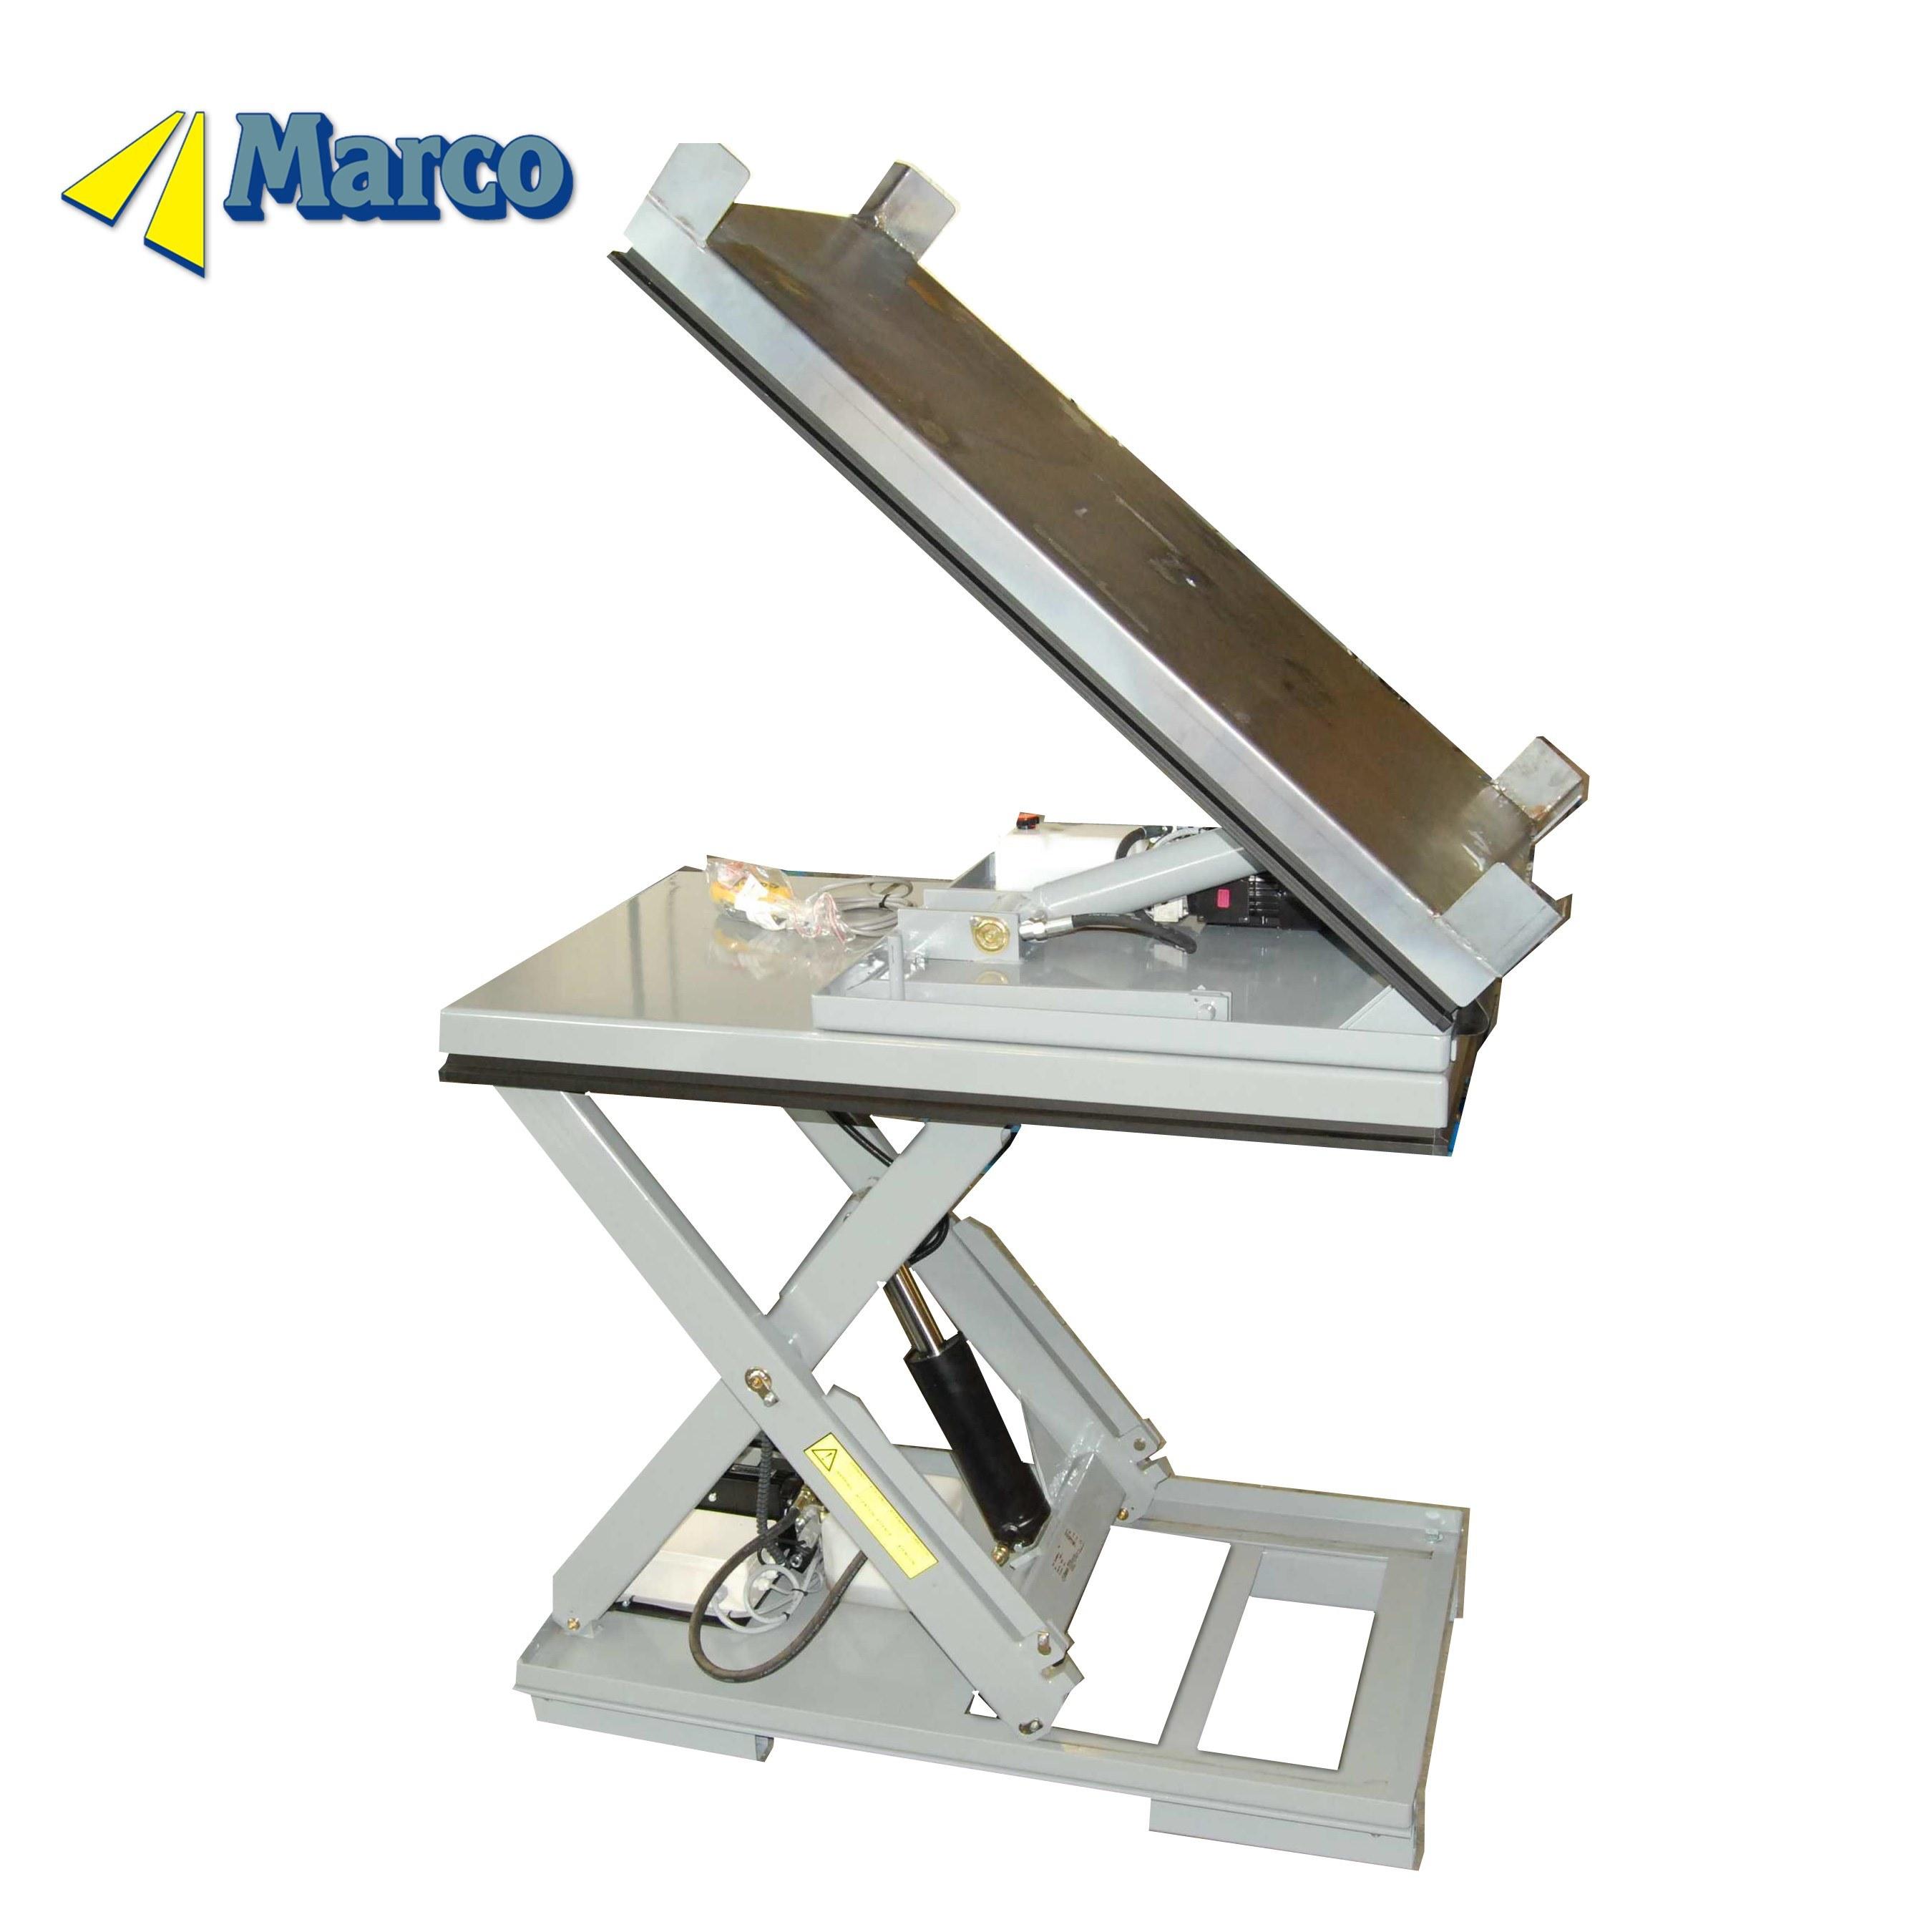 Marco Customsized 40 Degree Tilt Pallet Hydraulic Scissor Lift Table